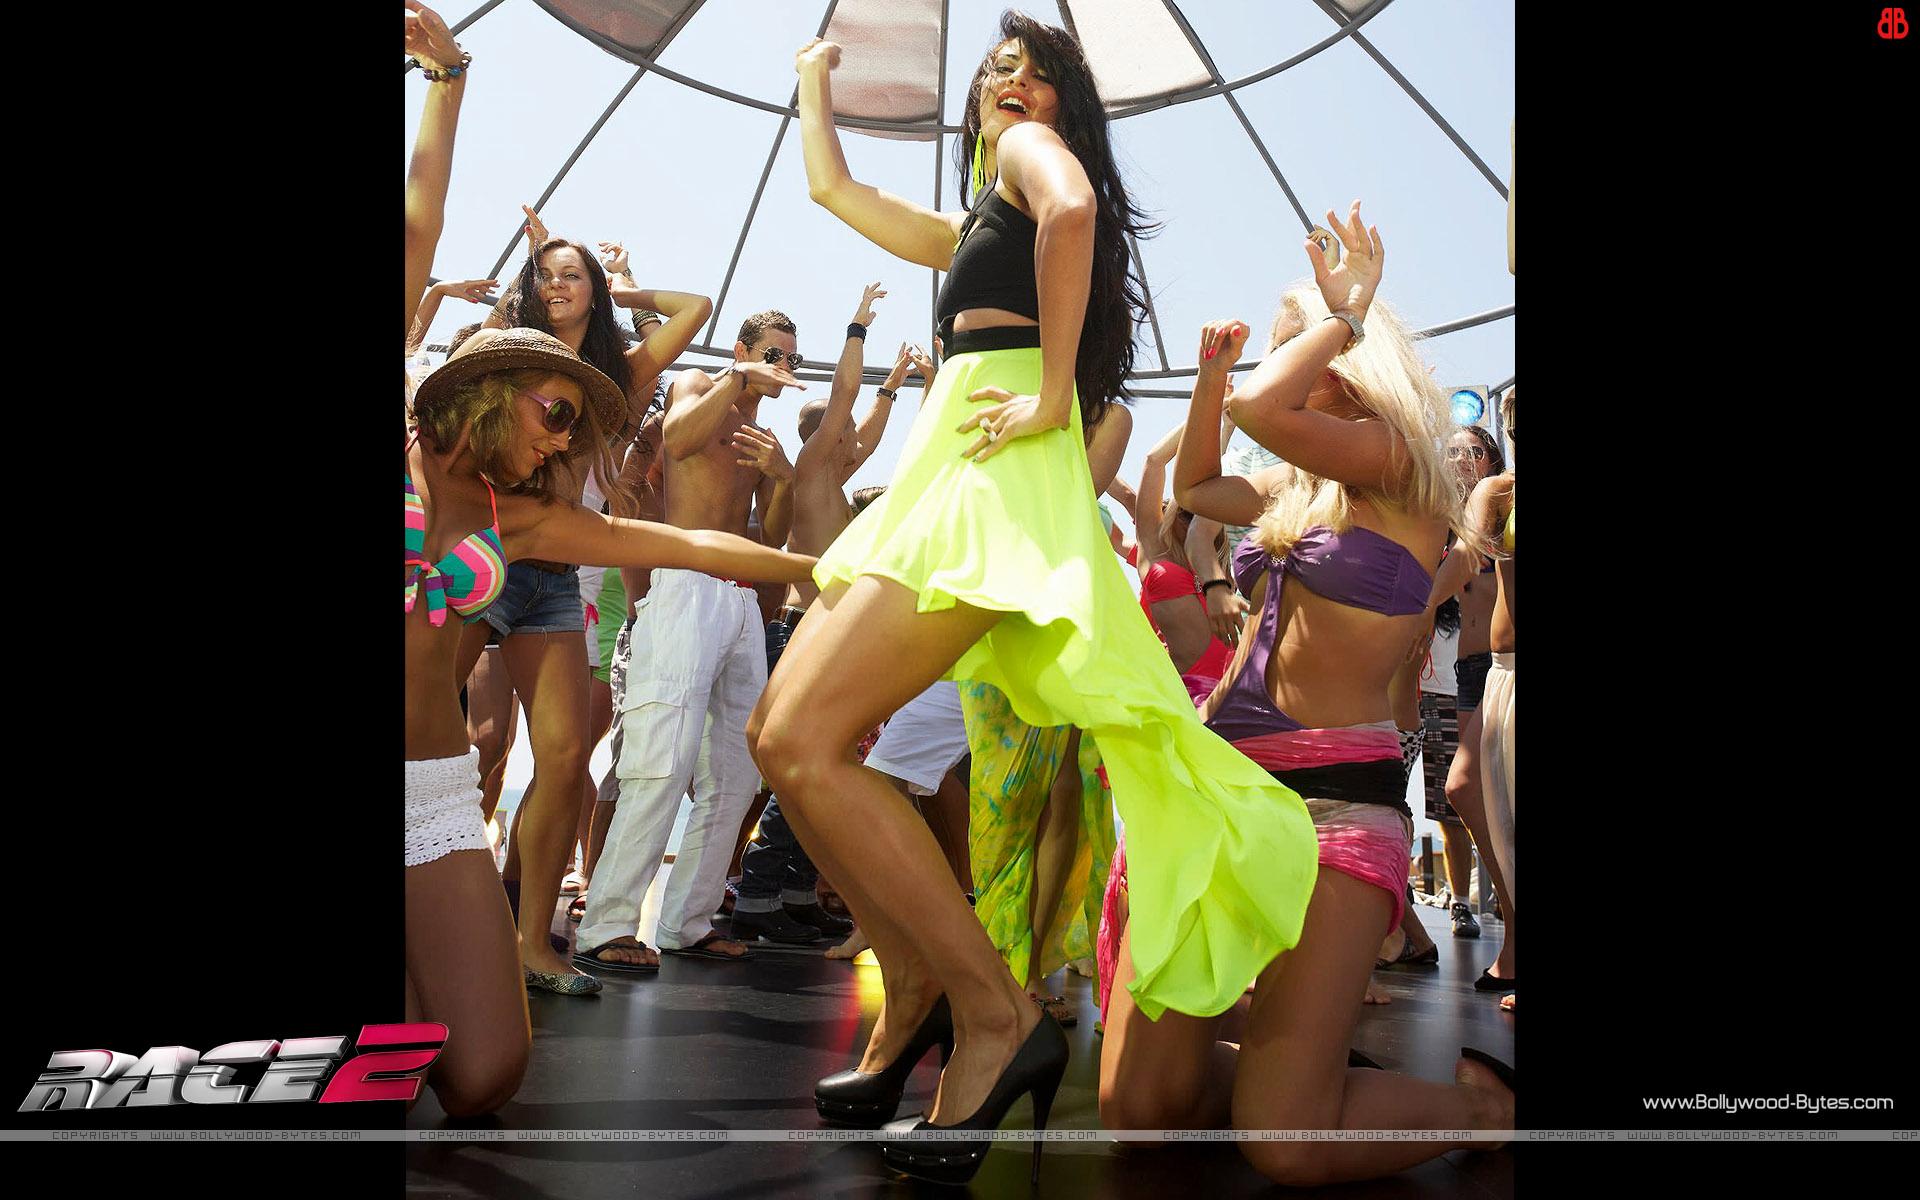 http://1.bp.blogspot.com/-8m0pM1PvoMo/UMrnrRMJxrI/AAAAAAAAVSE/YuR50GmcrkE/s1920/Race-2-+Hot-Jacqueline-Fernandez-HD-Wallpaper-22.jpg